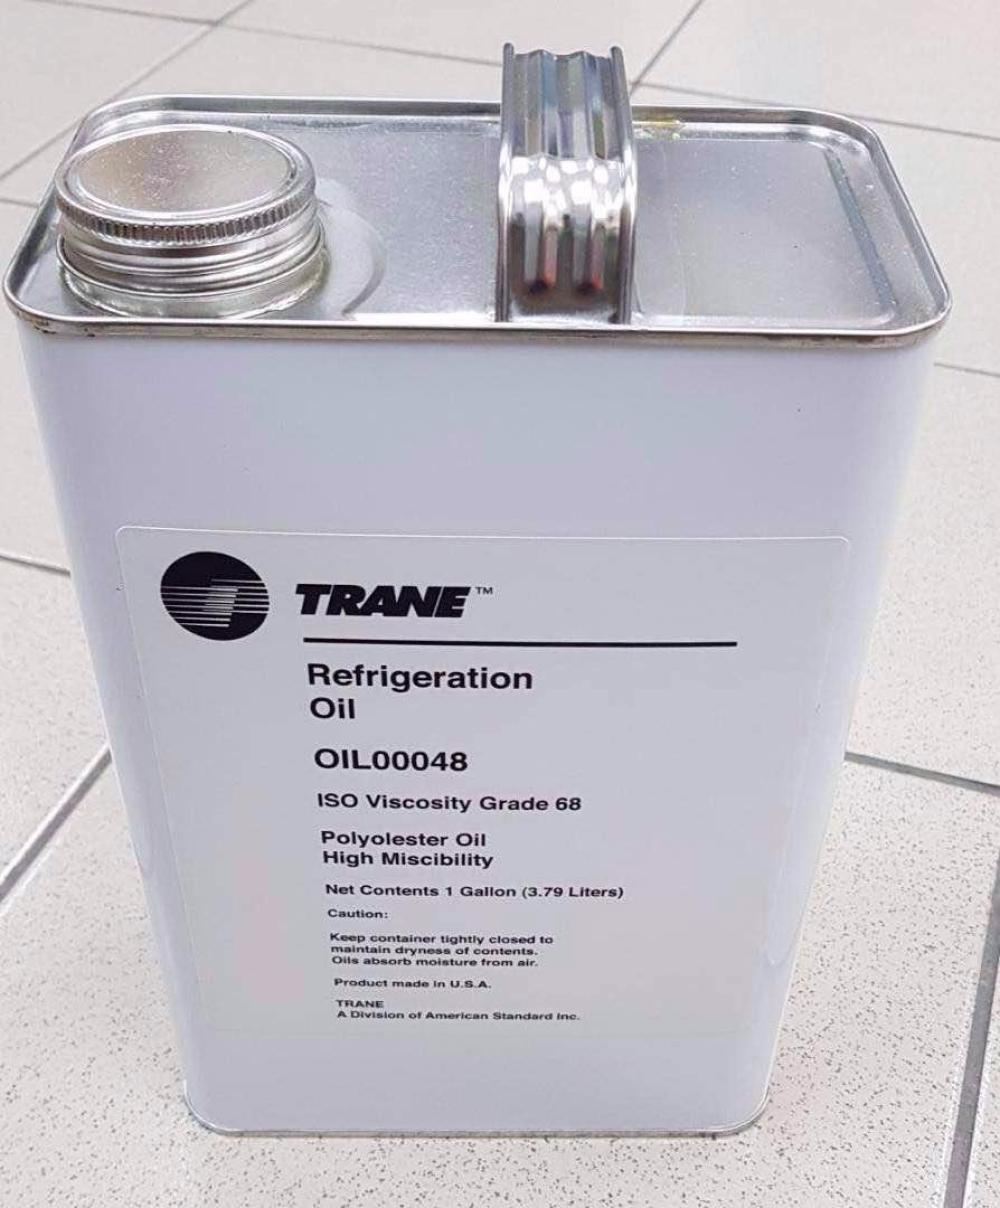 TRANE REFRIGERATION OIL TRANE Lubricant Oil and Equipment Subang Jaya, Selangor, Kuala Lumpur (KL), Malaysia. Supplier, Supplies, Manufacturer, Wholesaler | Culmi Air-Cond & Refrigeration Parts Supply Sdn Bhd